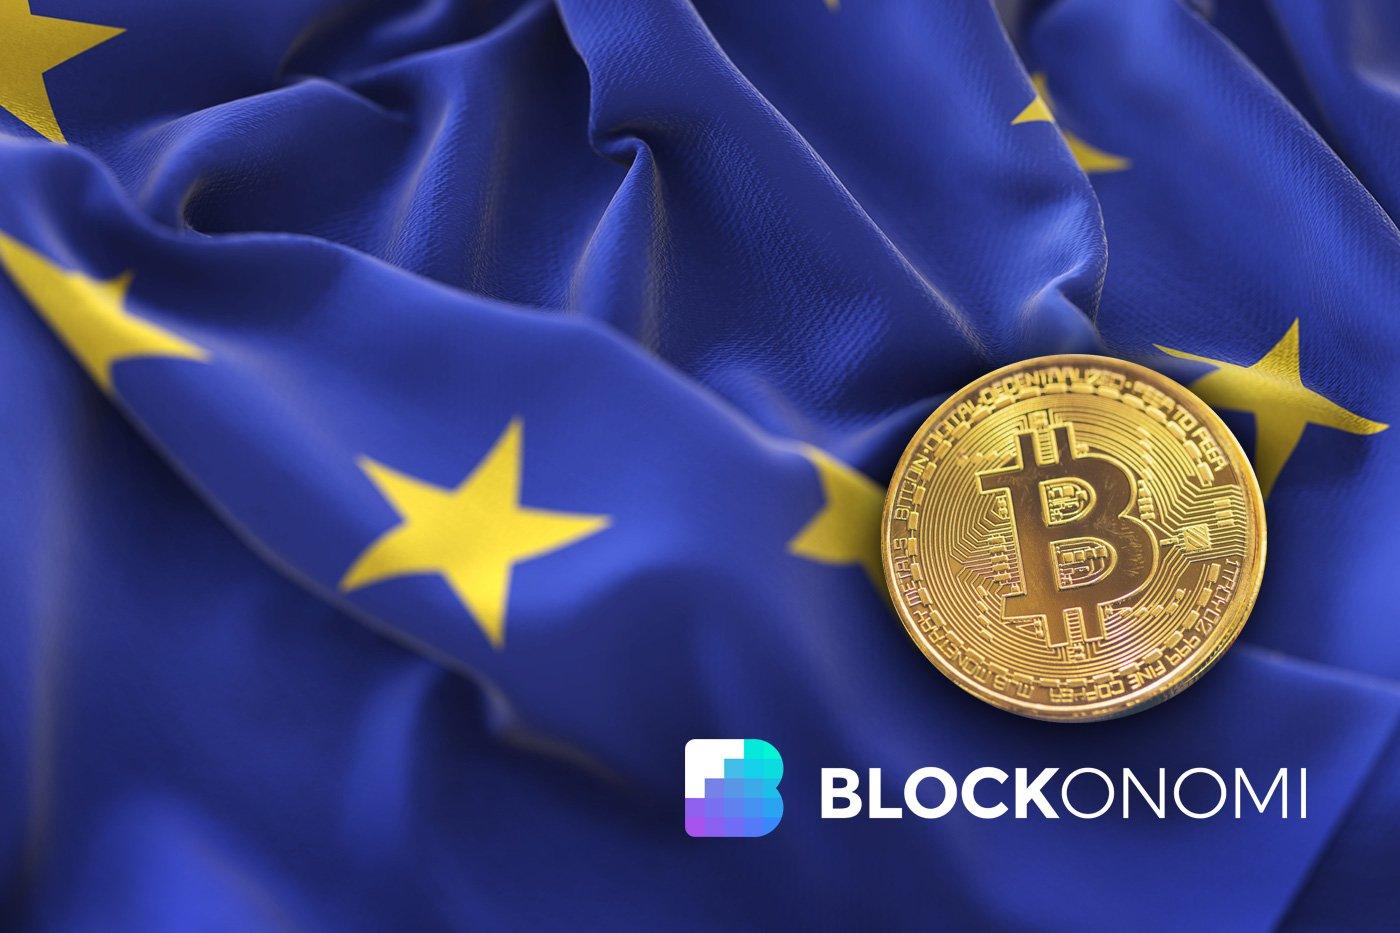 Euro Blockchain